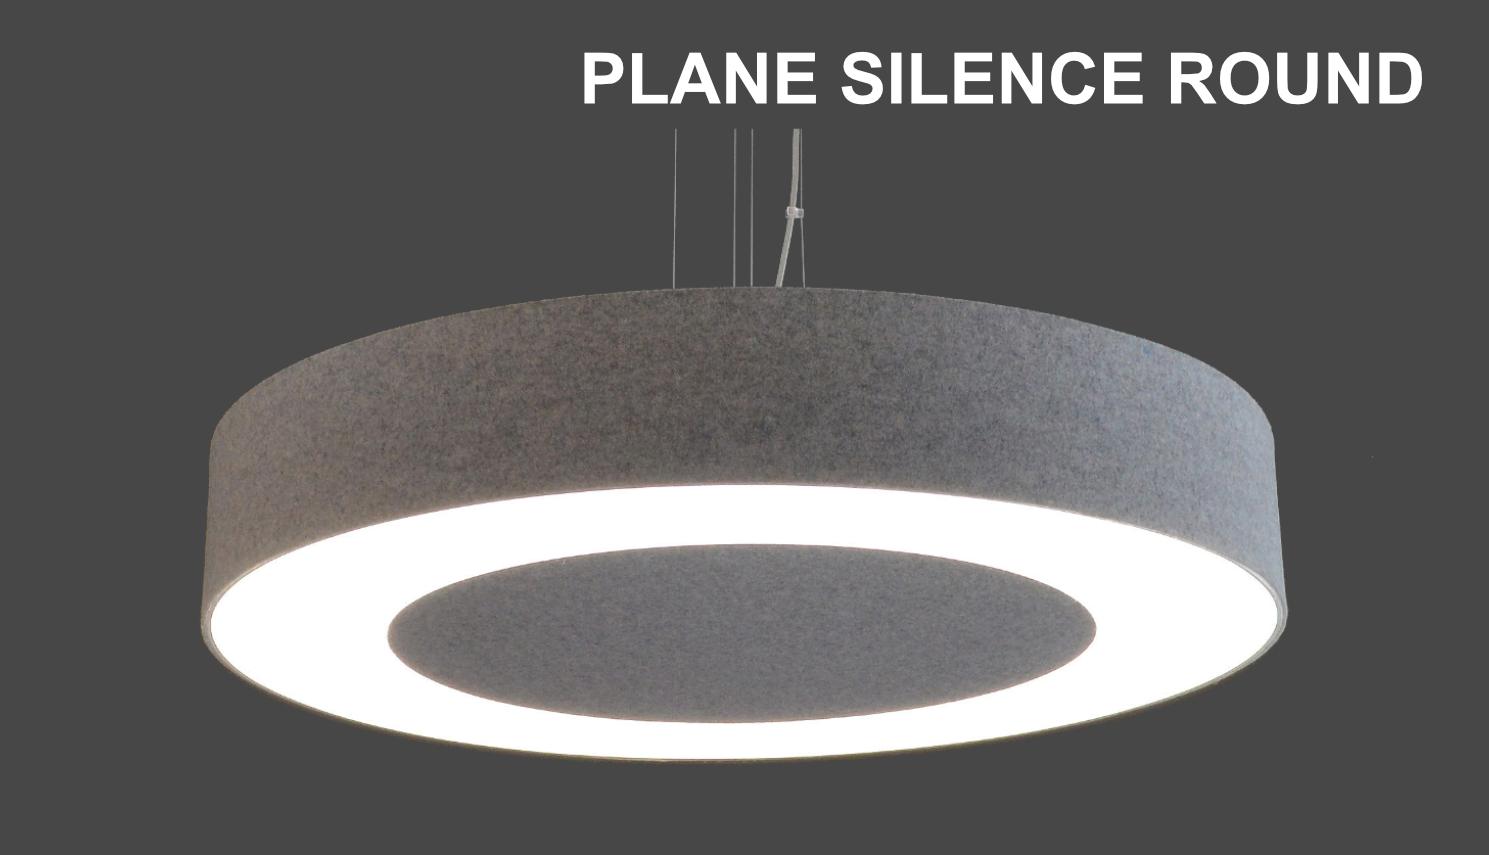 PLANE SILENCE ROUND